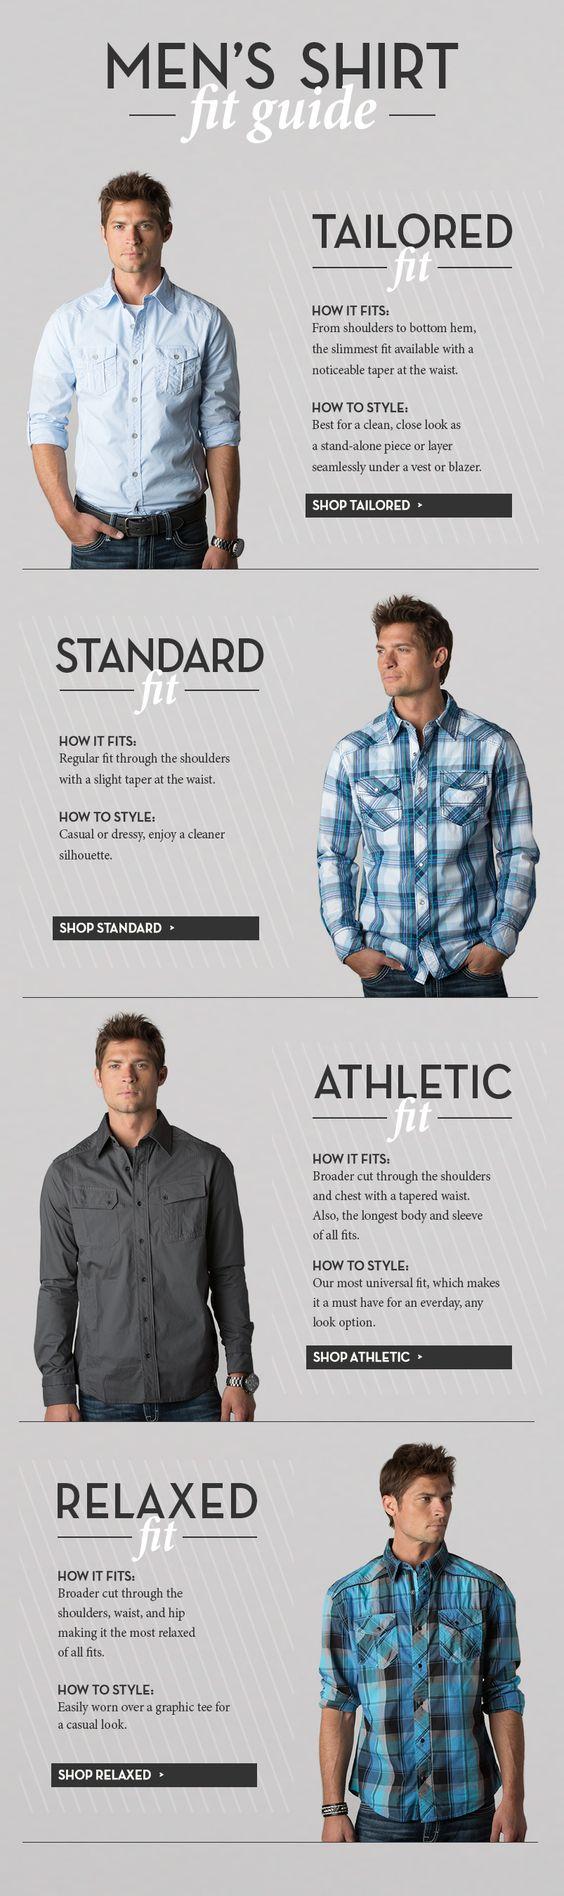 Men's shirt fit guide